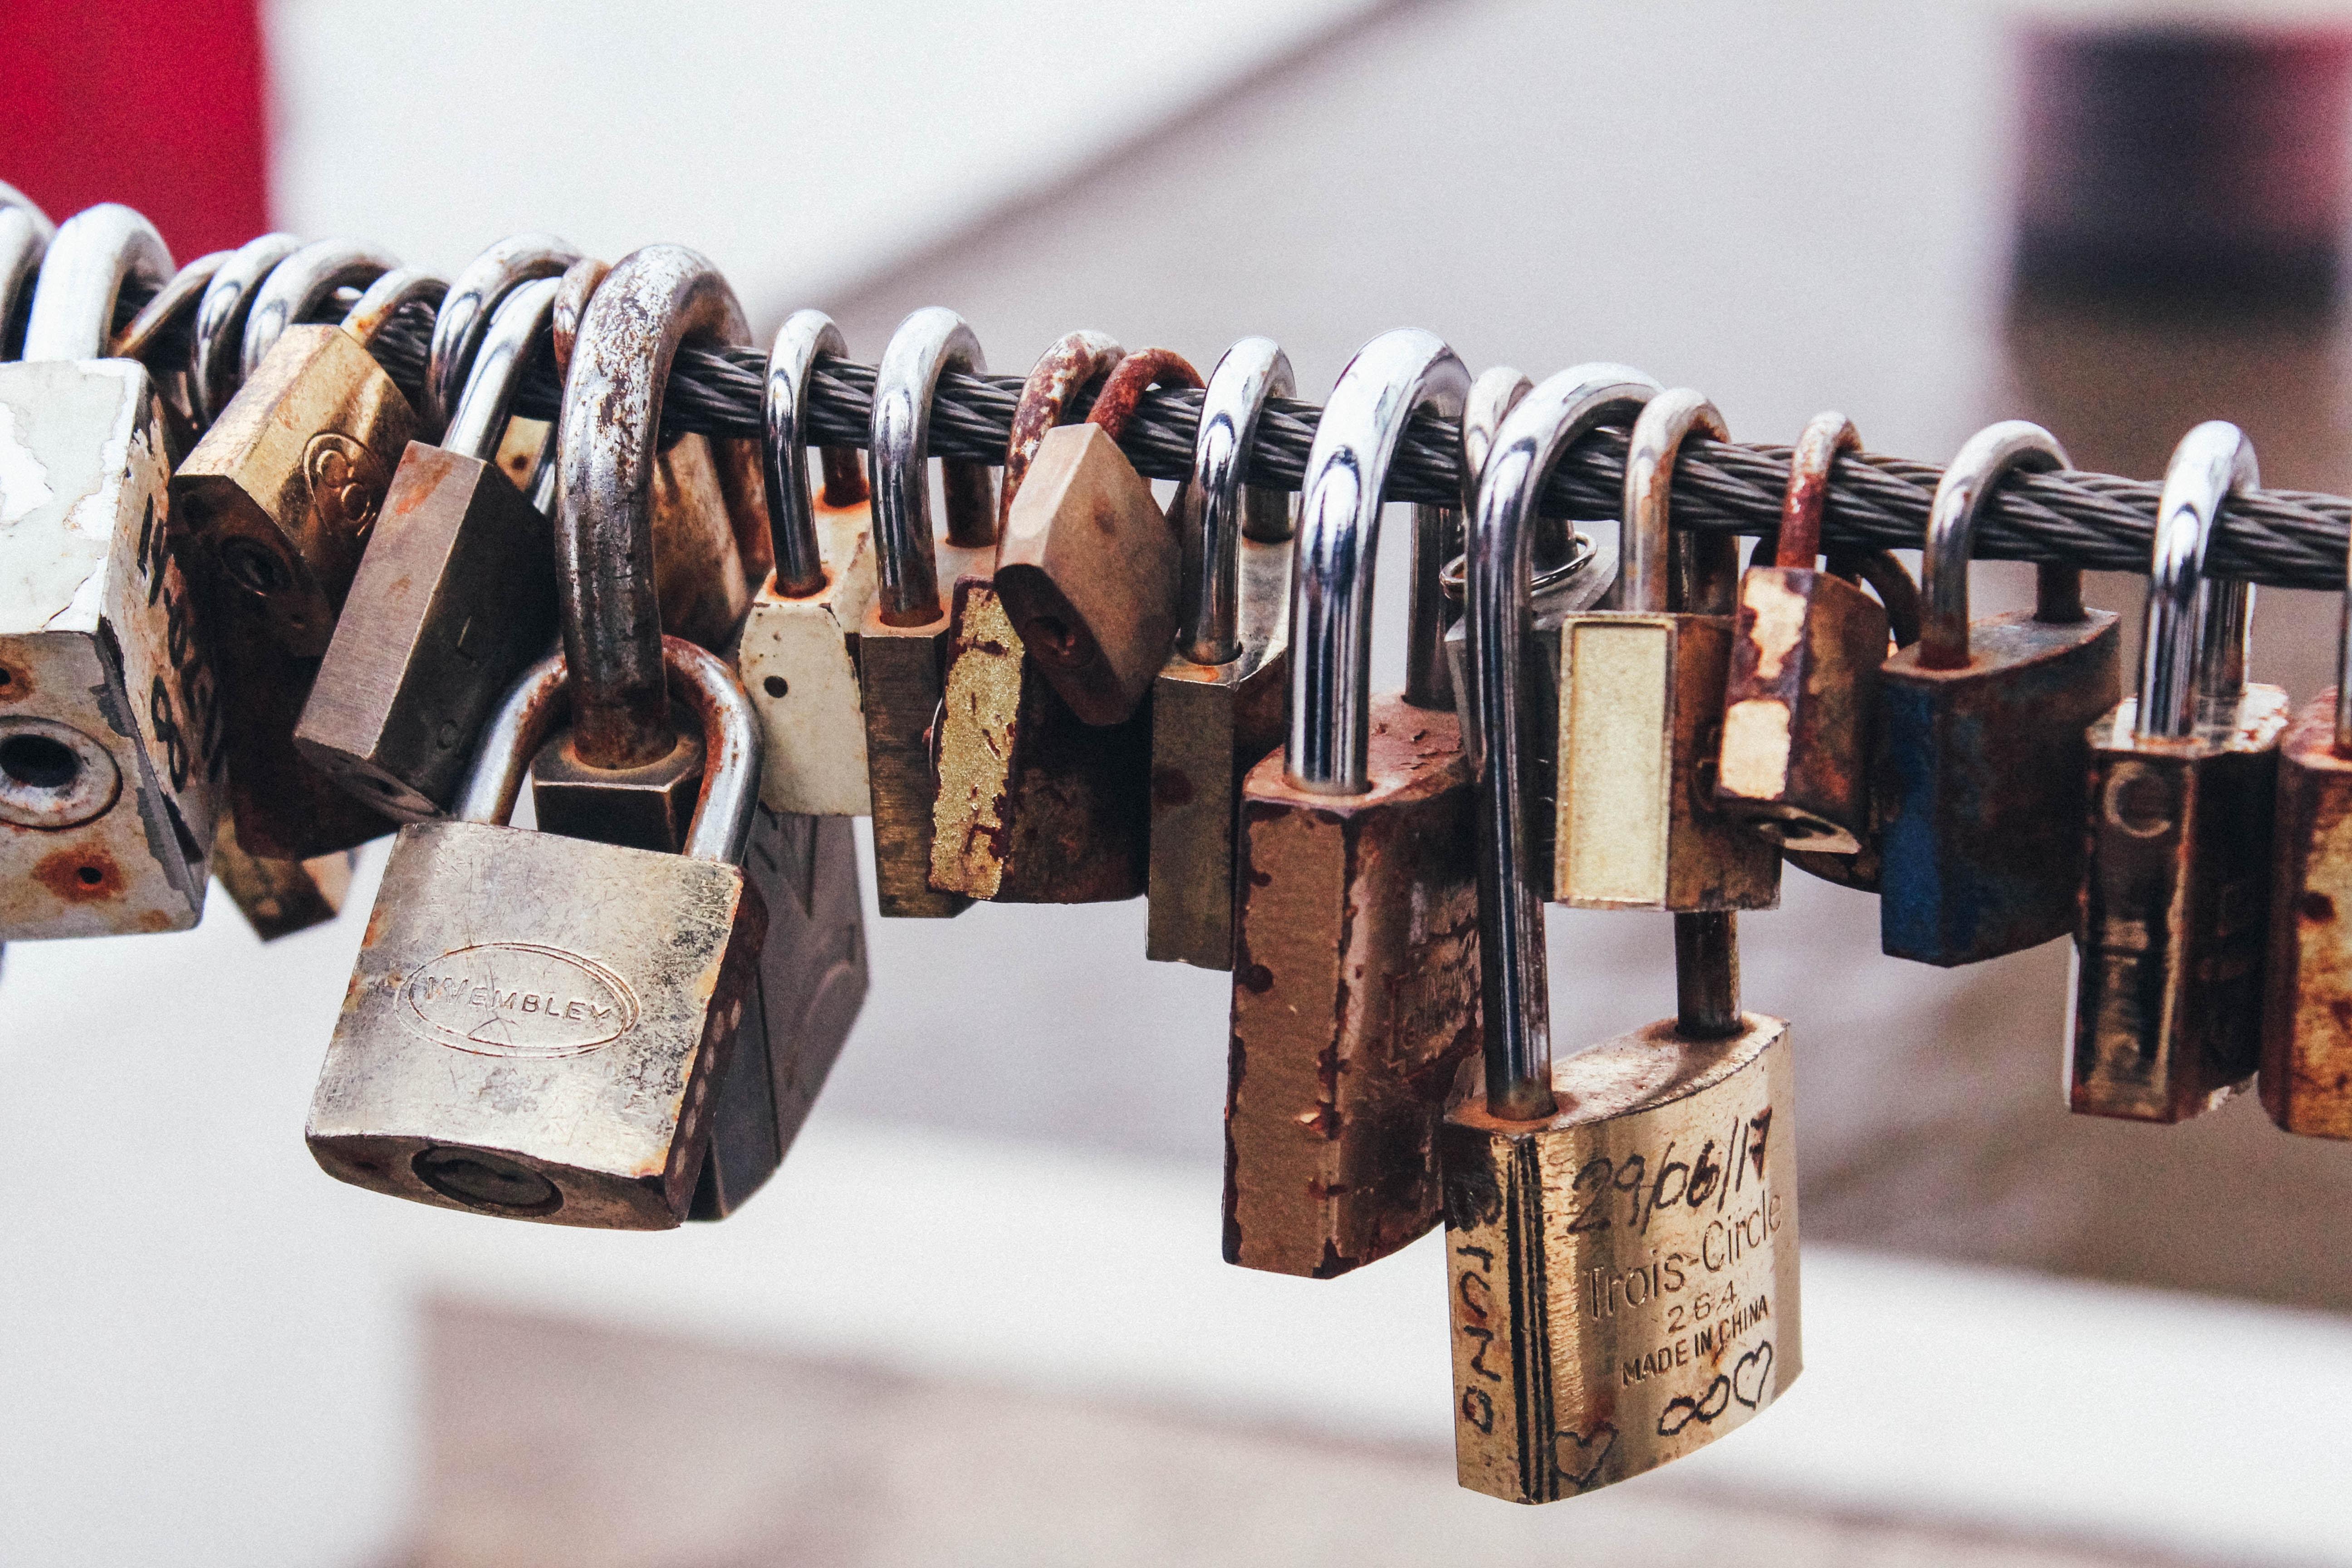 3 Key Password Management Policies To Safeguard Your Dental Practice Data